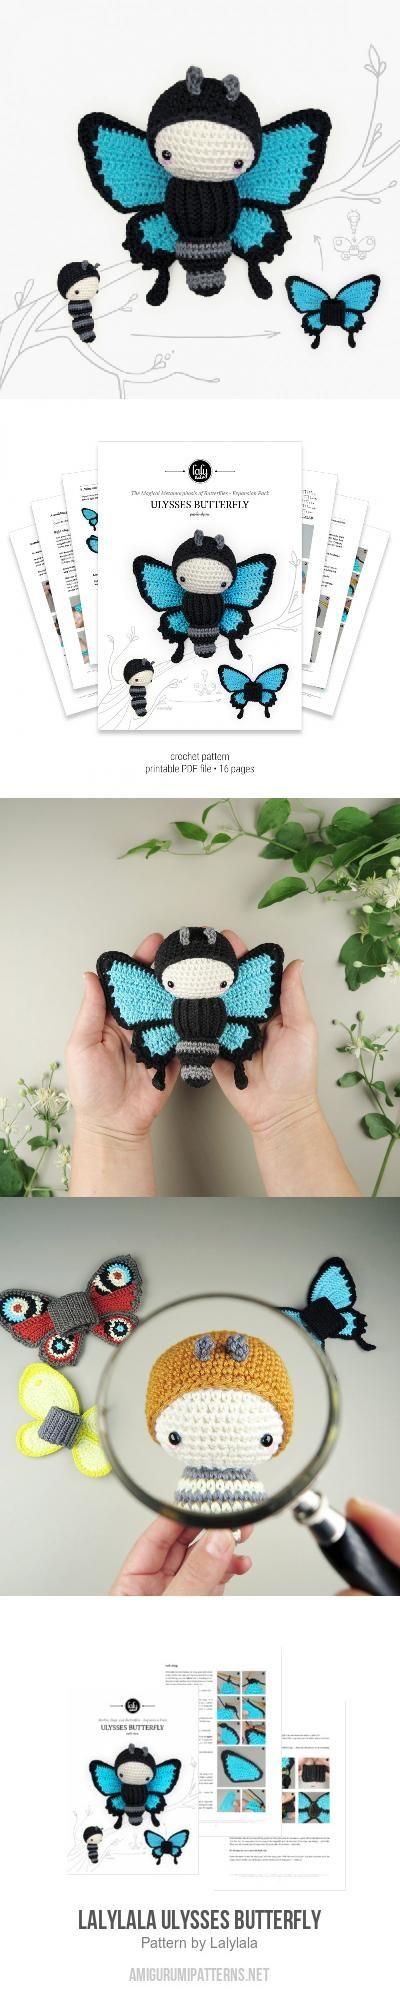 Lalylala ULYSSES Butterfly Amigurumi Pattern | insekten | Pinterest ...